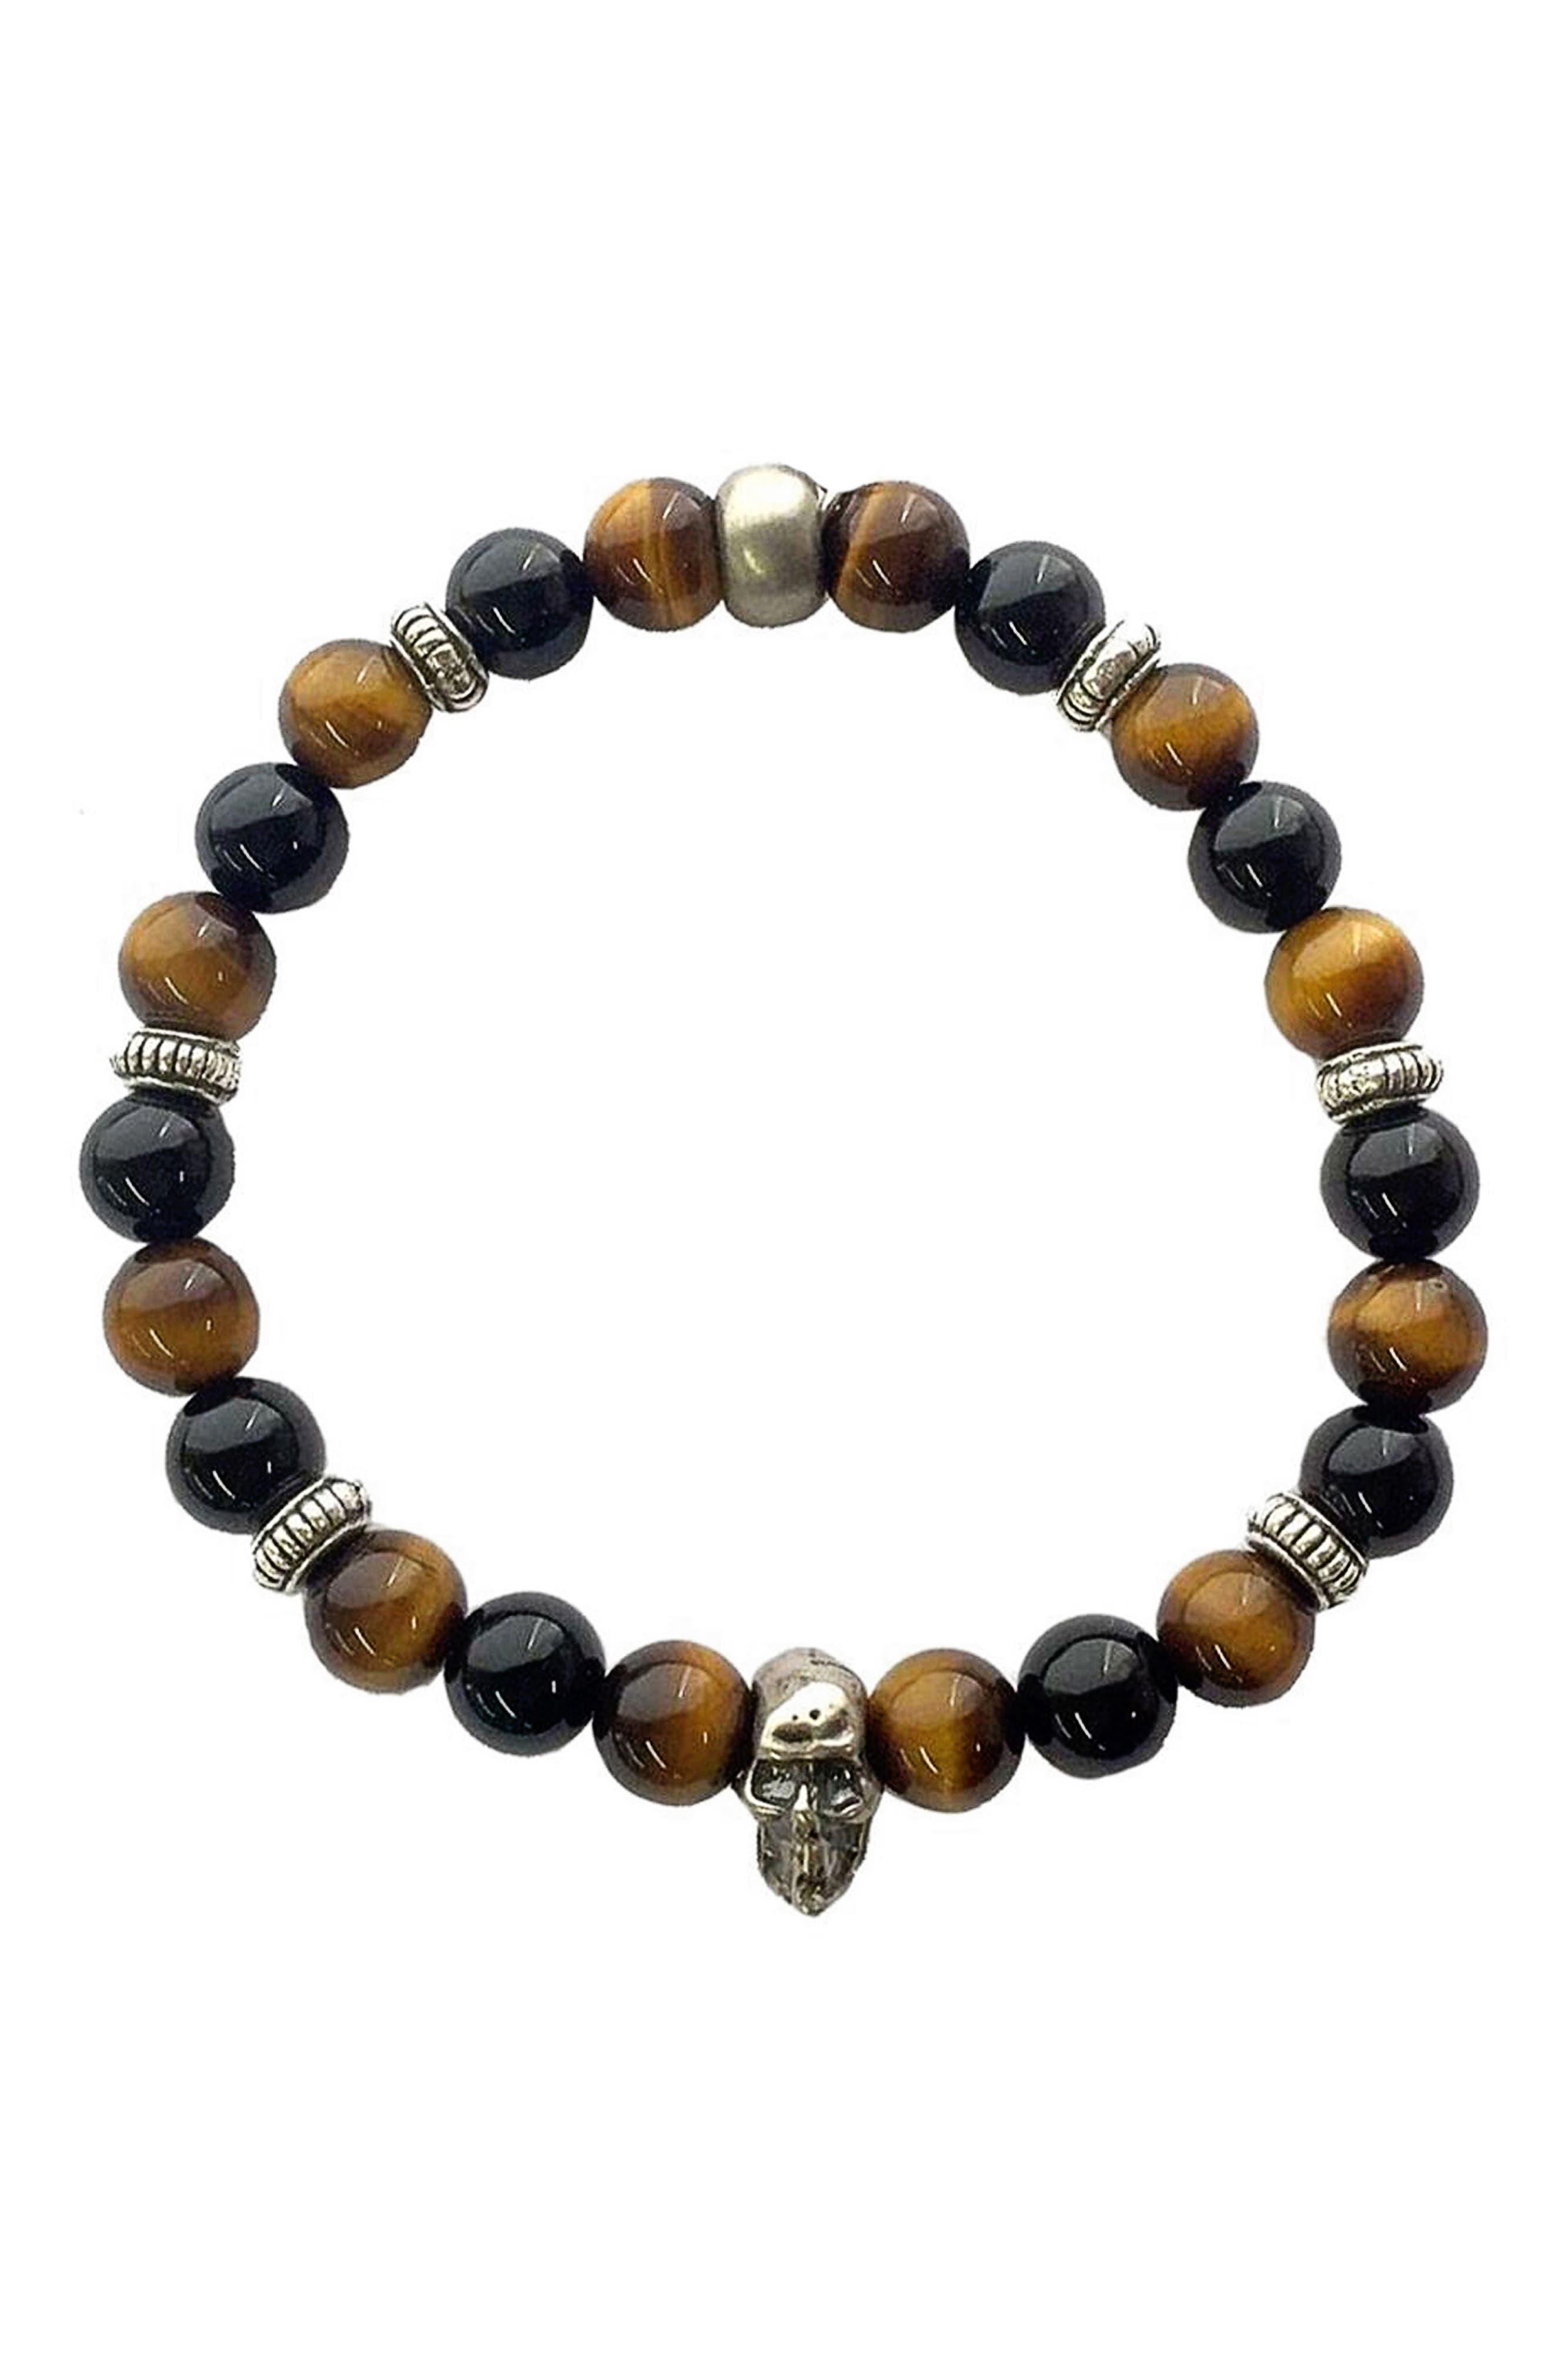 Tiger's-Eye Onyx Stretch Bracelet,                             Main thumbnail 1, color,                             001